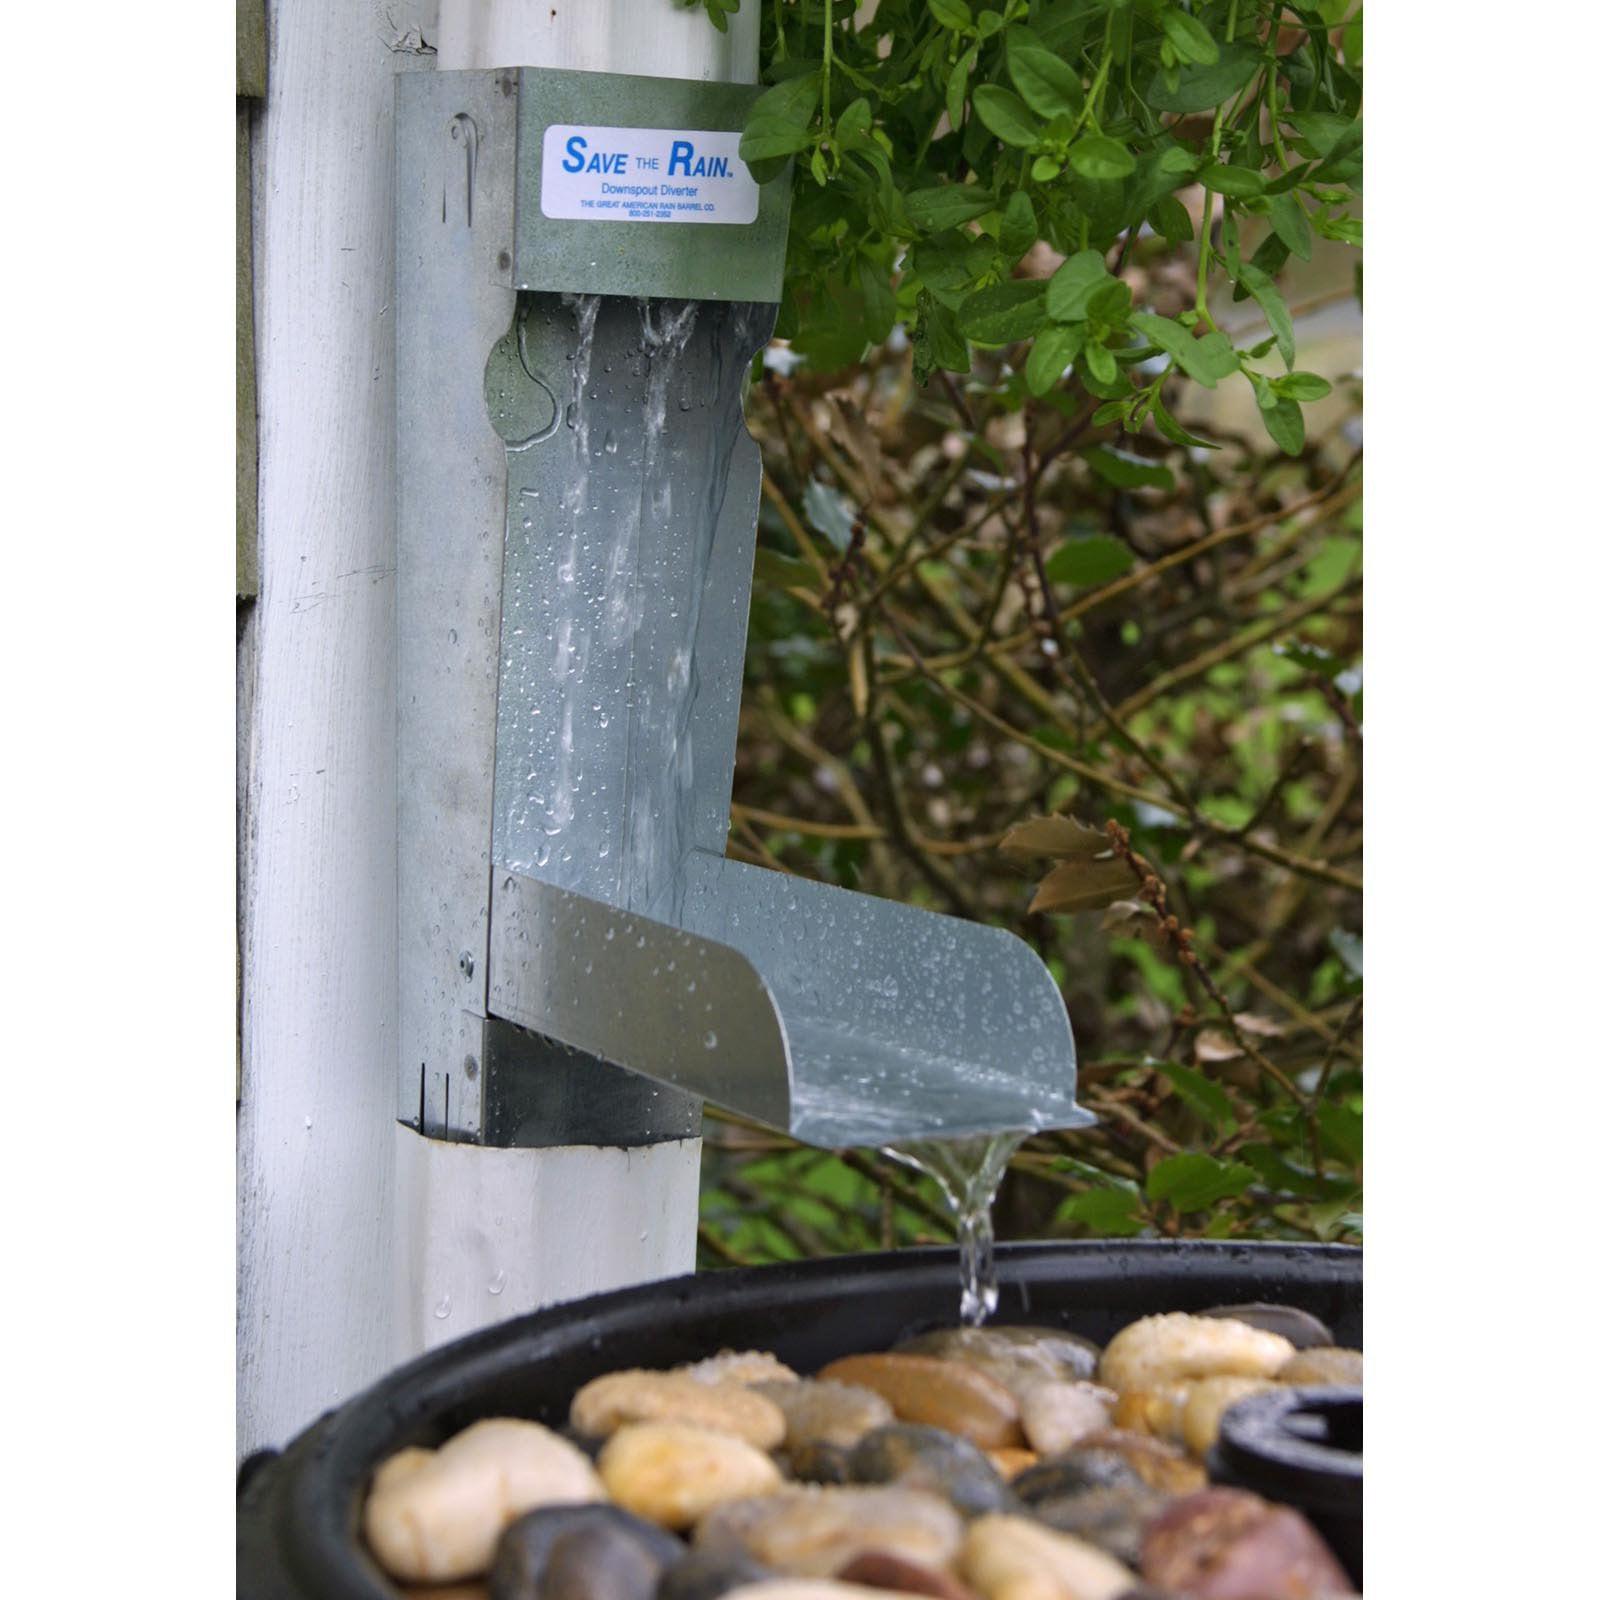 Save the Rain Water Metal Diverter  - 2 x 3 or 3 x 4